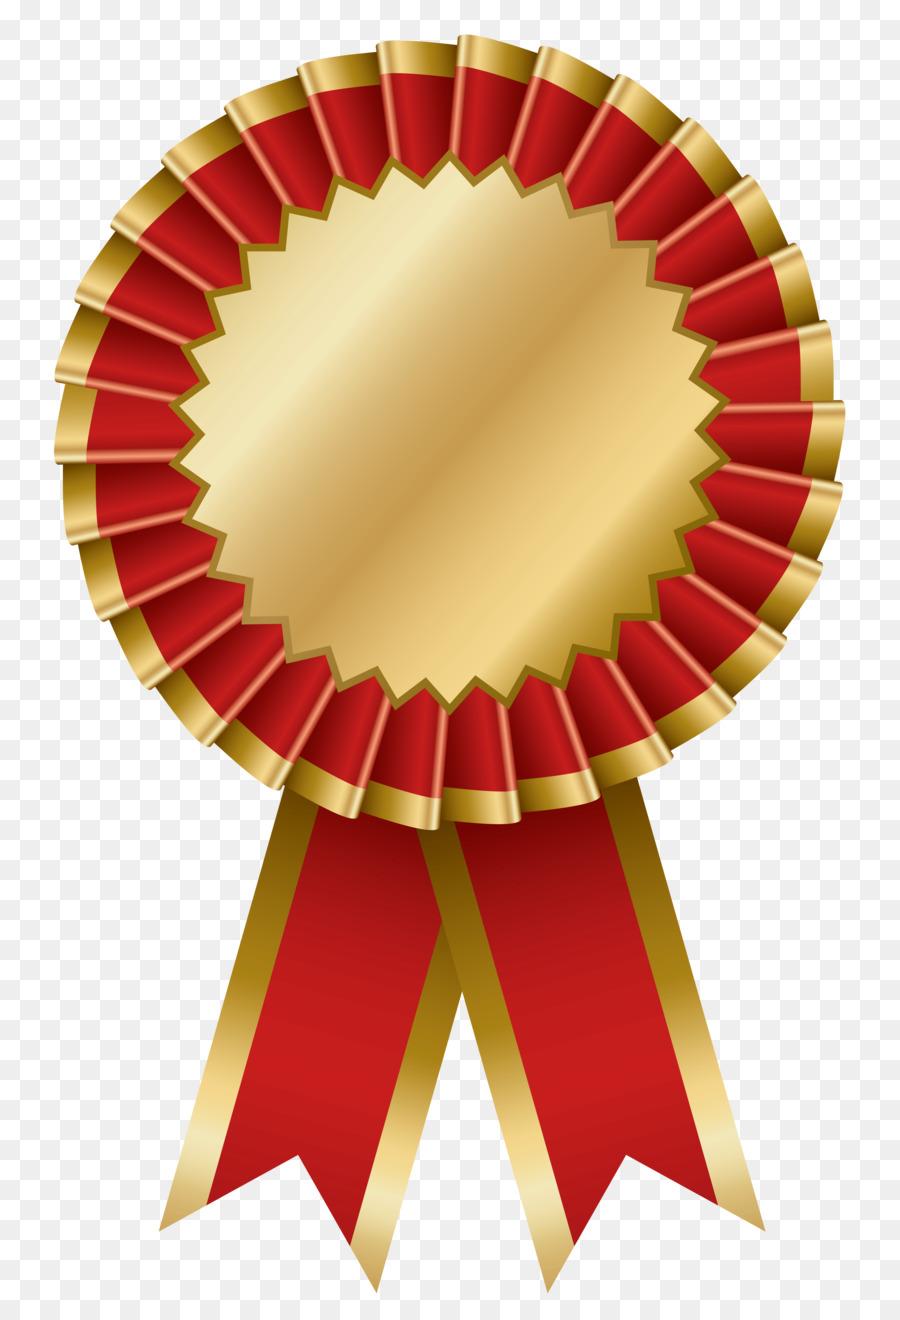 Ribbon Gold medal Clip art - Transparent-Ribbon Gold medal Clip art - Transparent Ribbon Cliparts-7